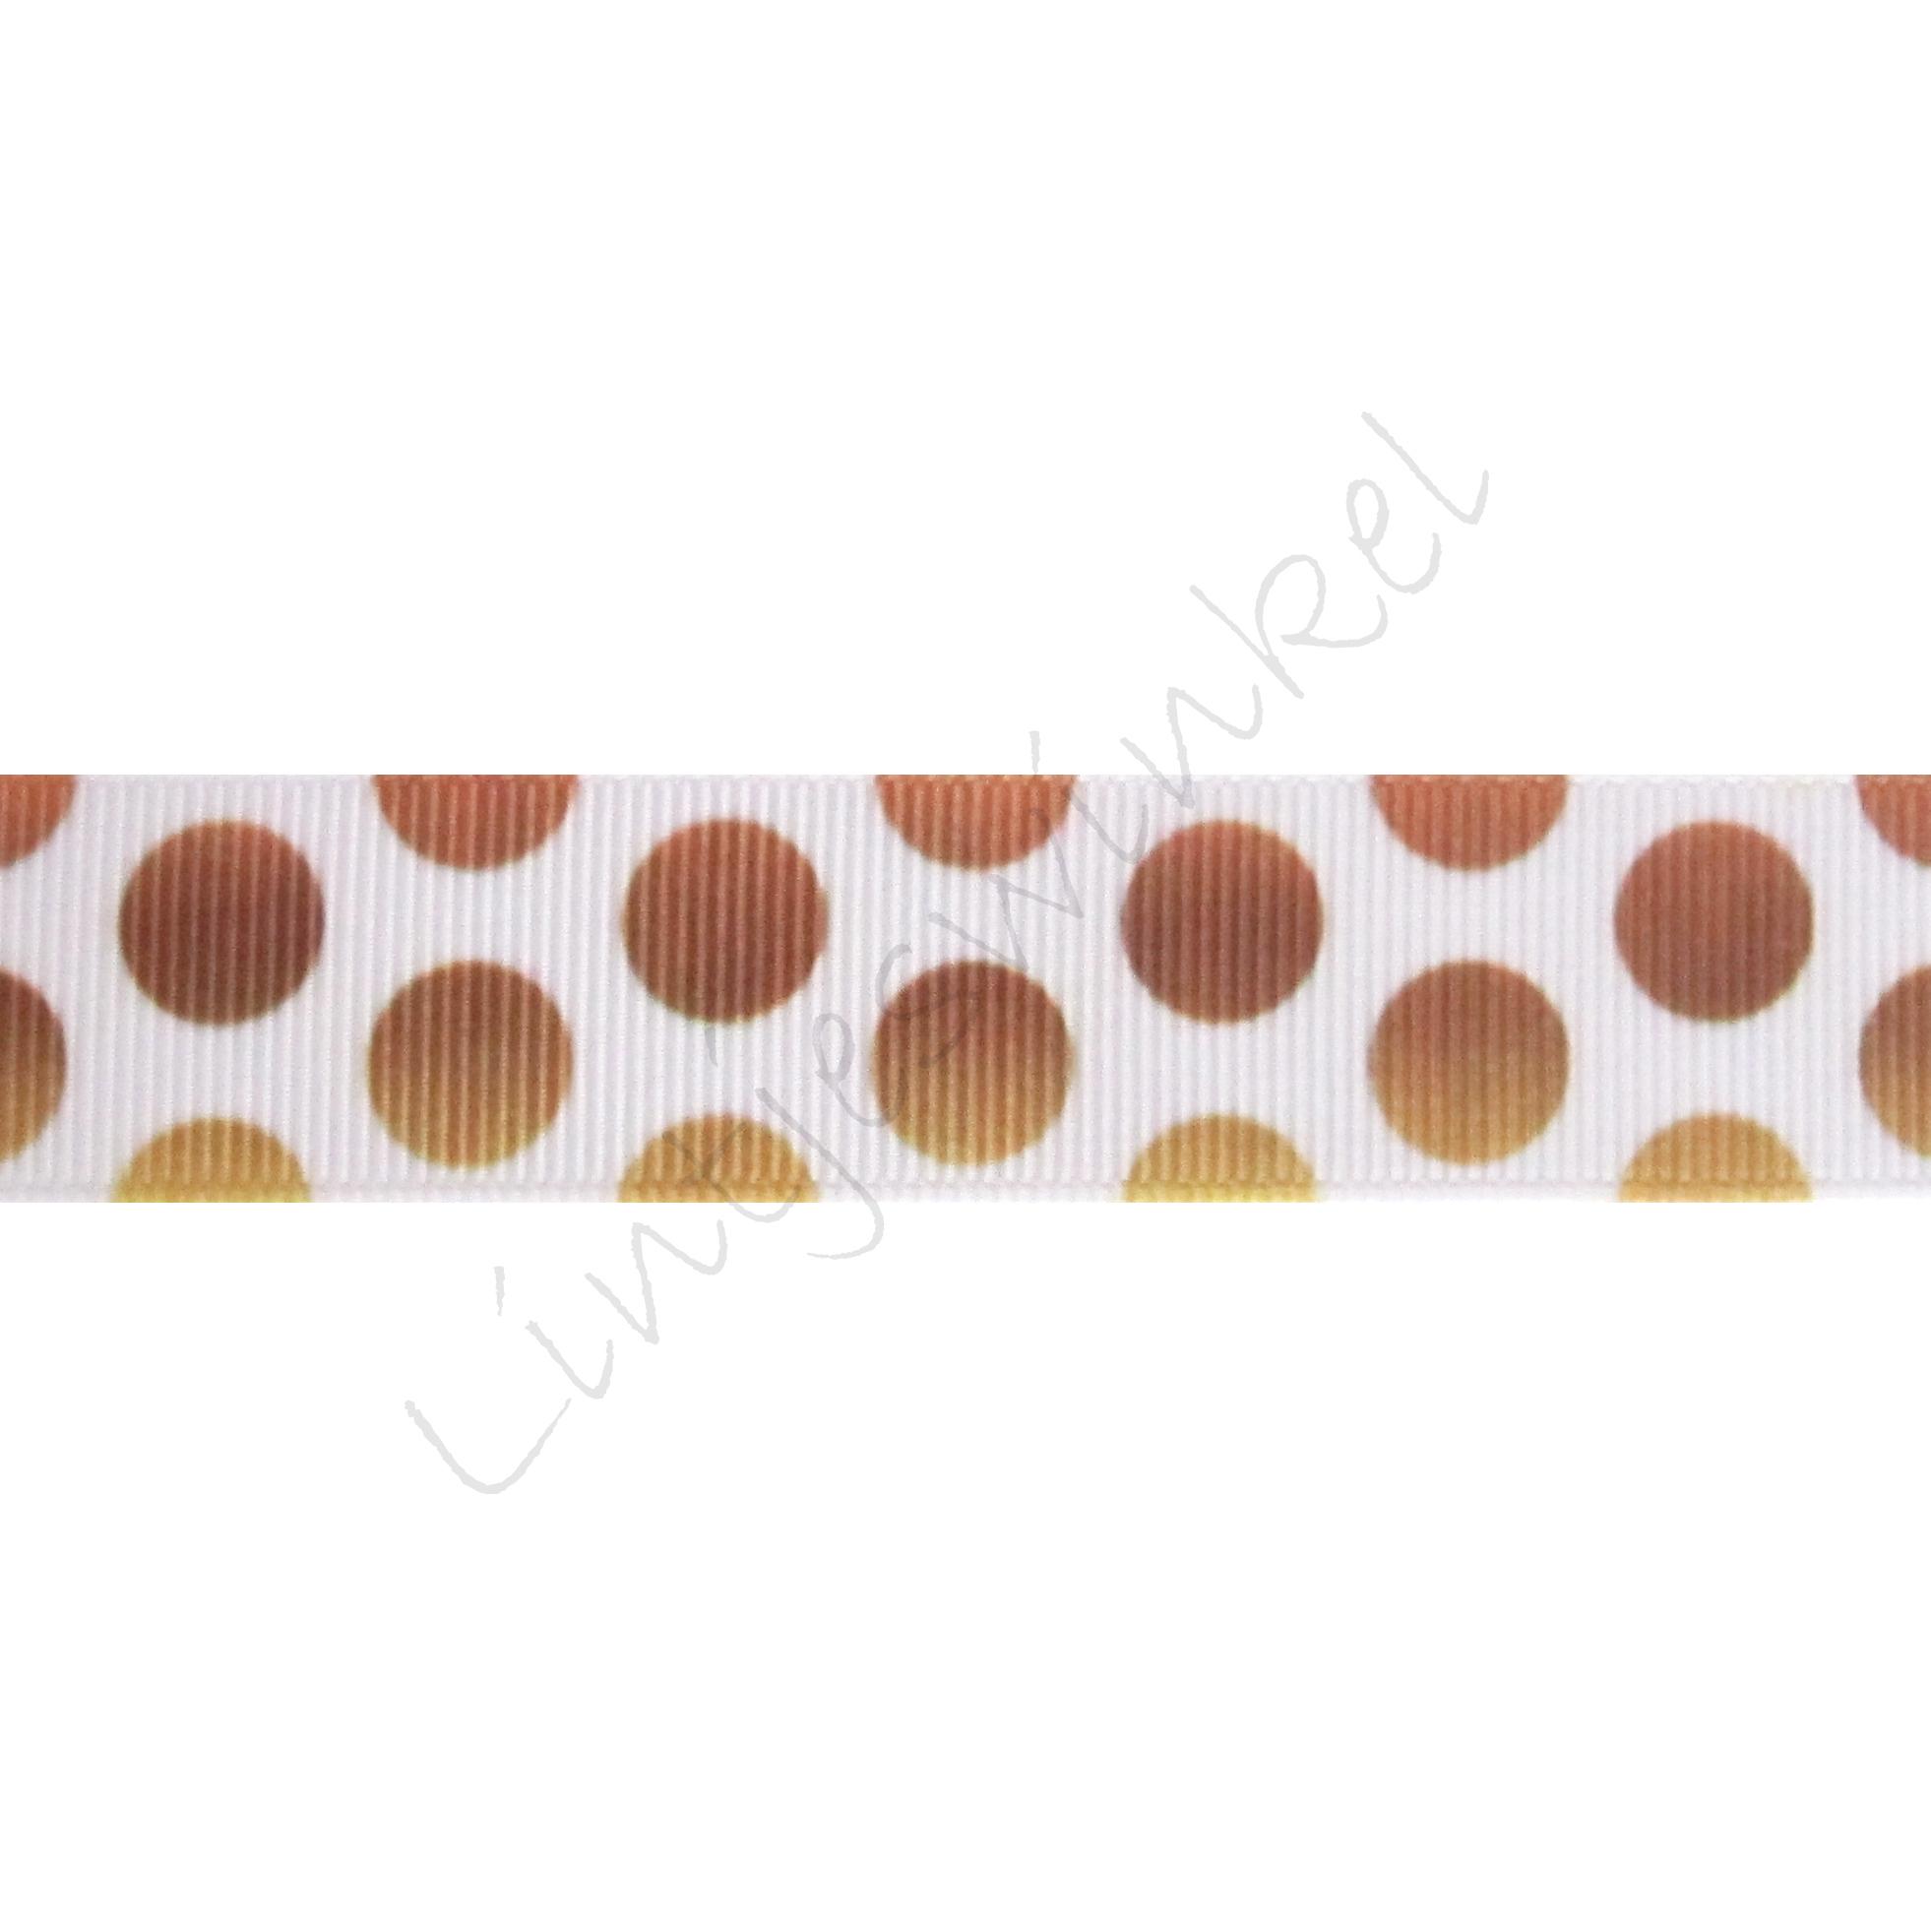 Ripsband Punkte Groß Mix 22mm - Weiß Goldbraun